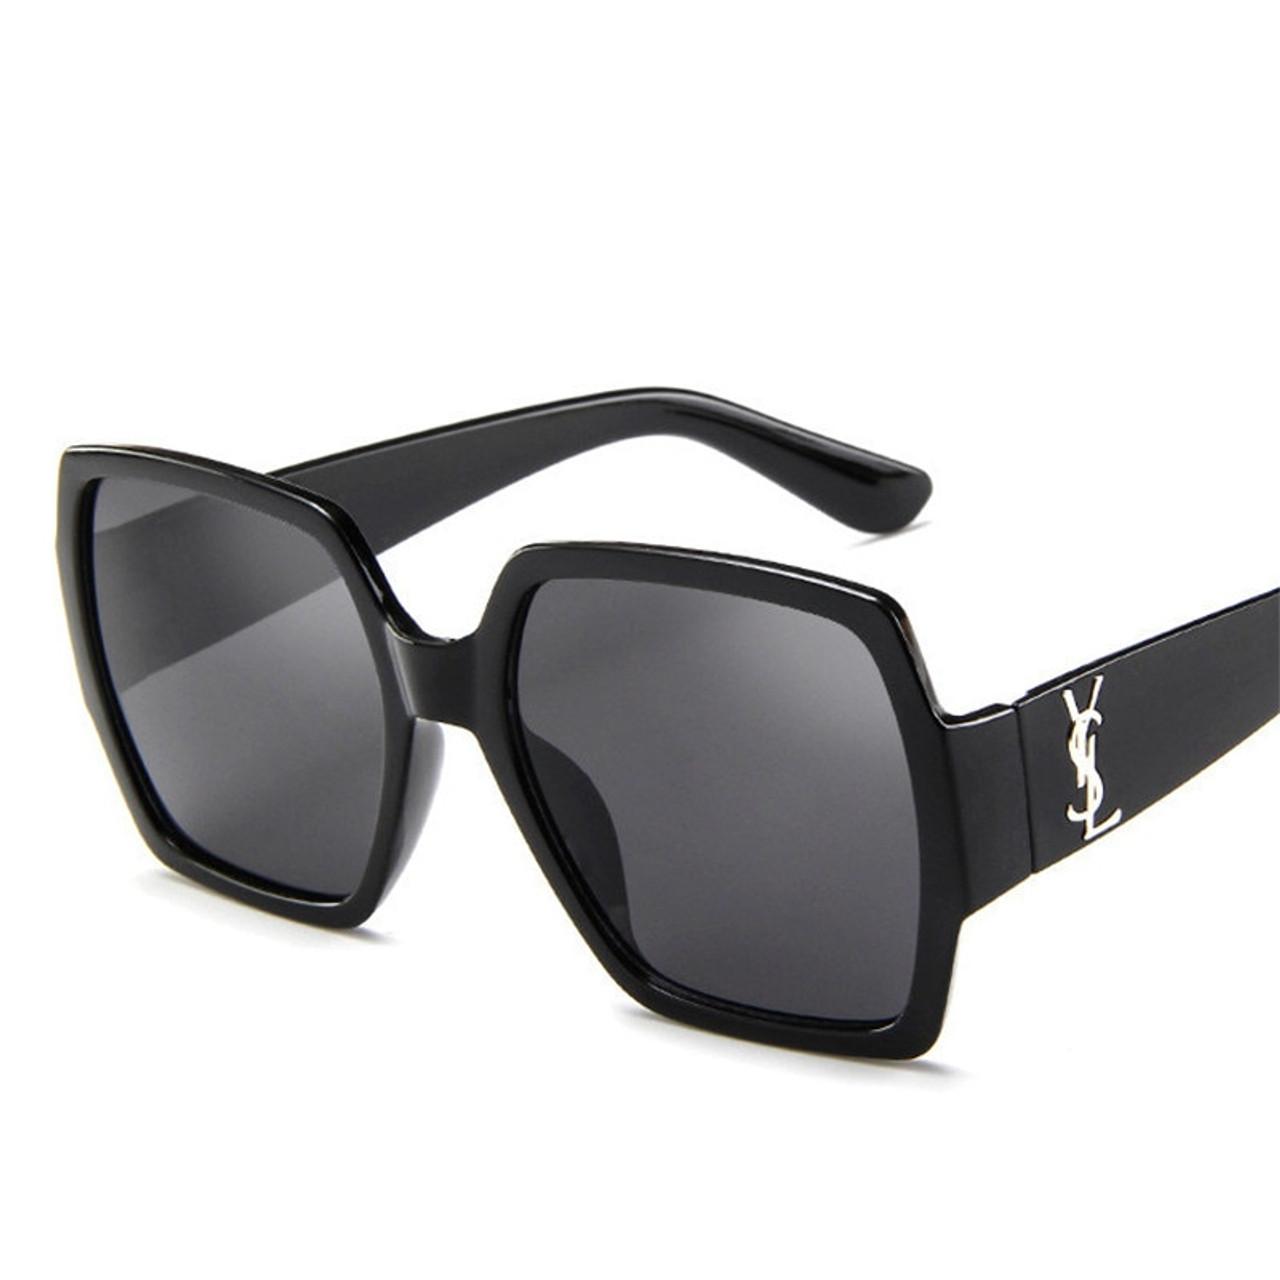 c357fb7e86 ... Oversized Sunglasses Women Big Frame Square Sun Glasses Men Brand  Designer 2019 New Vintage Gradient Shades ...